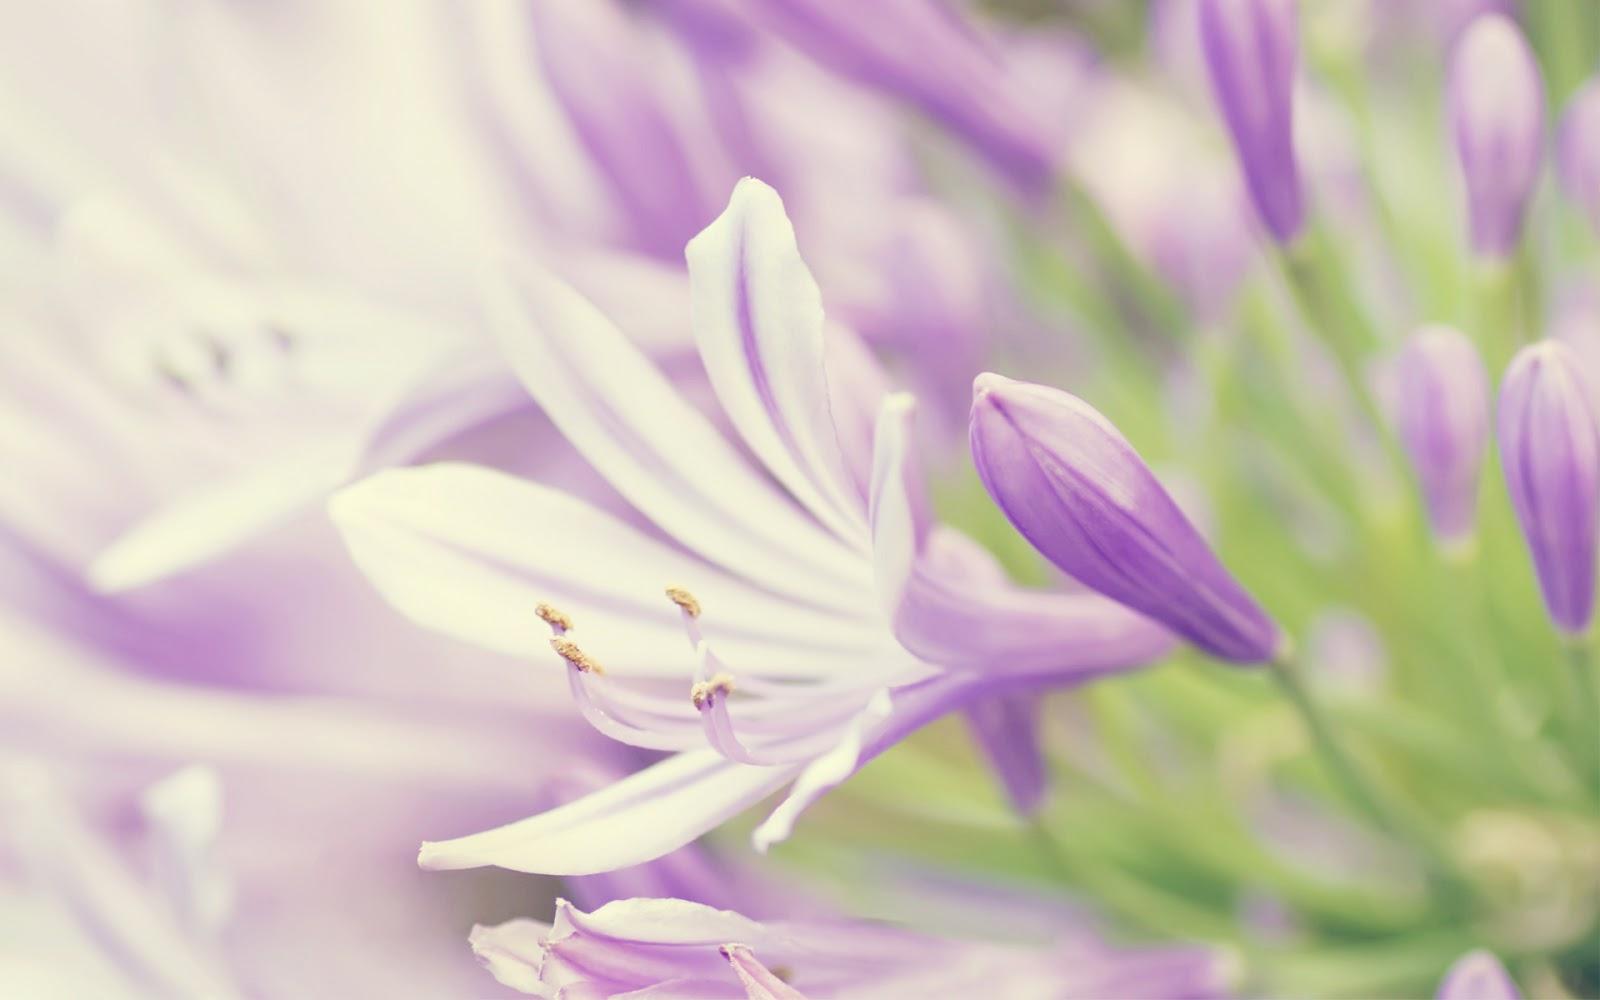 30 Wallpaper Bunga Paling Indah Dan Cantik Buat Laptop Dan